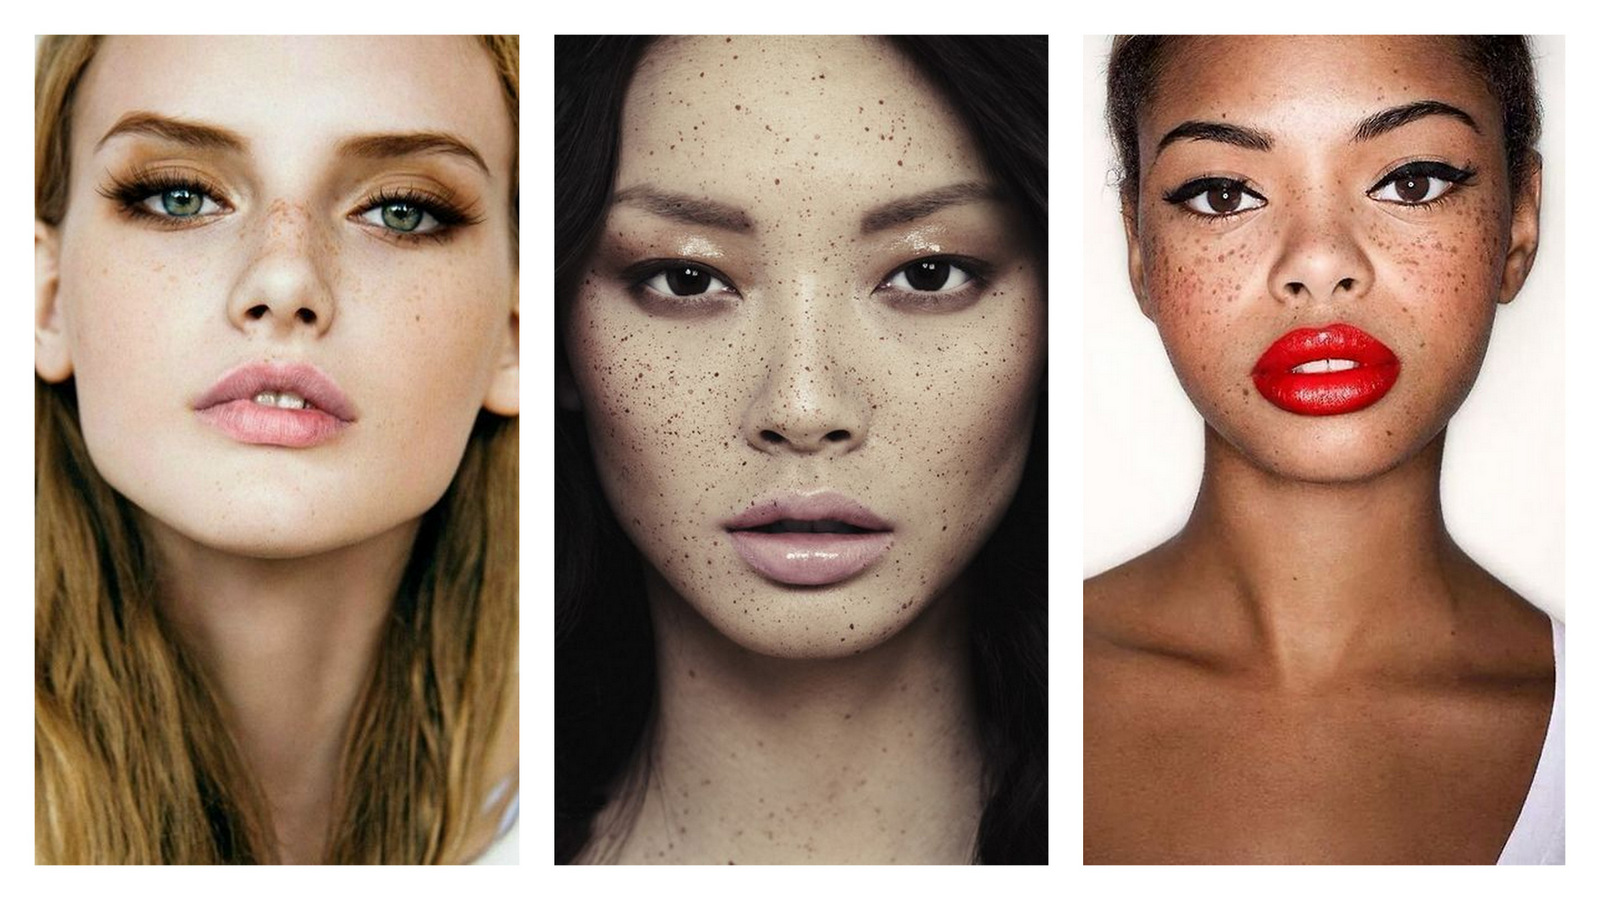 makeupforfreckles